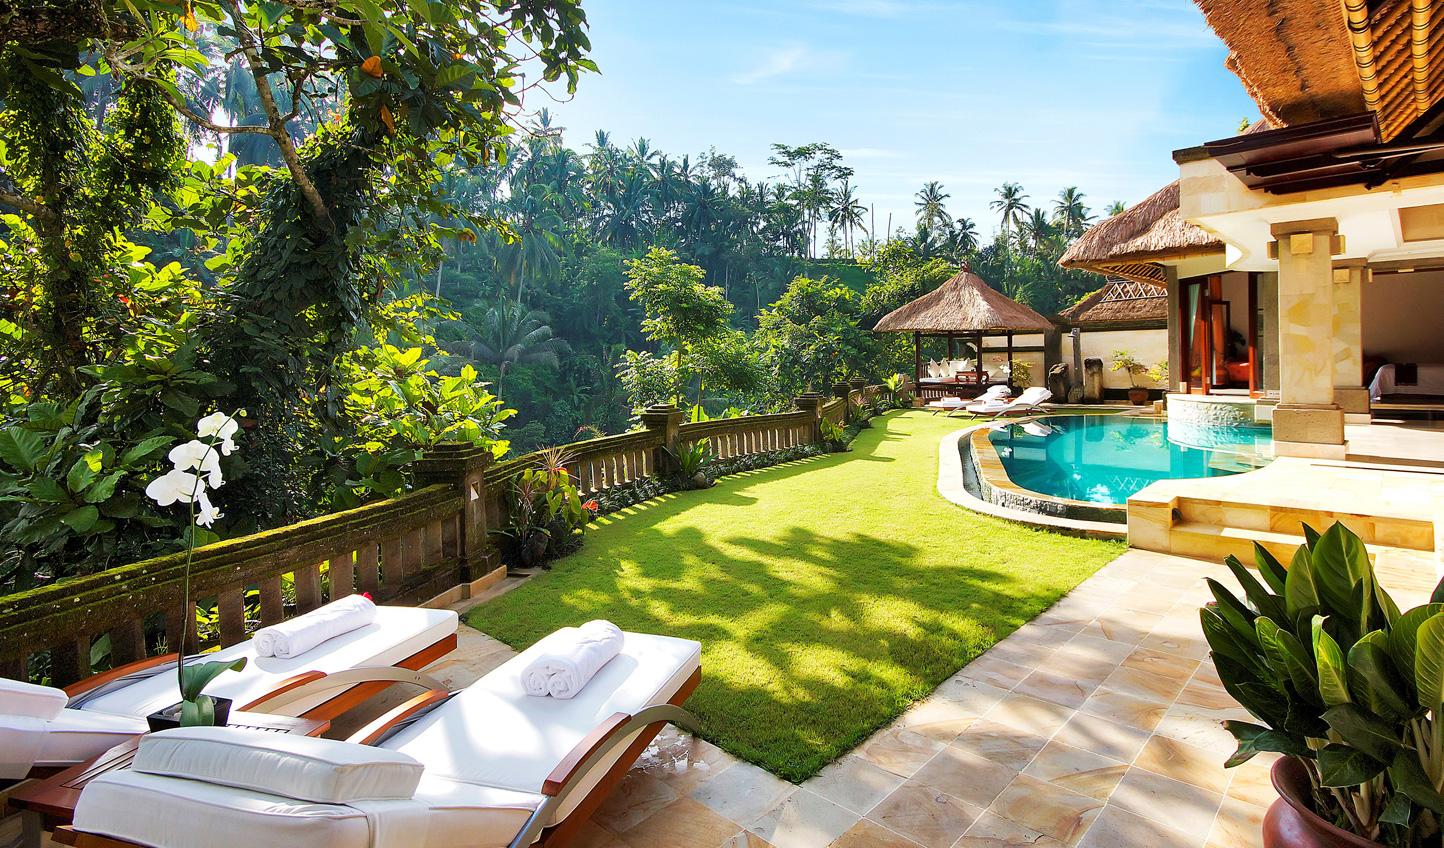 Regal splendour in the Viceroy Villa